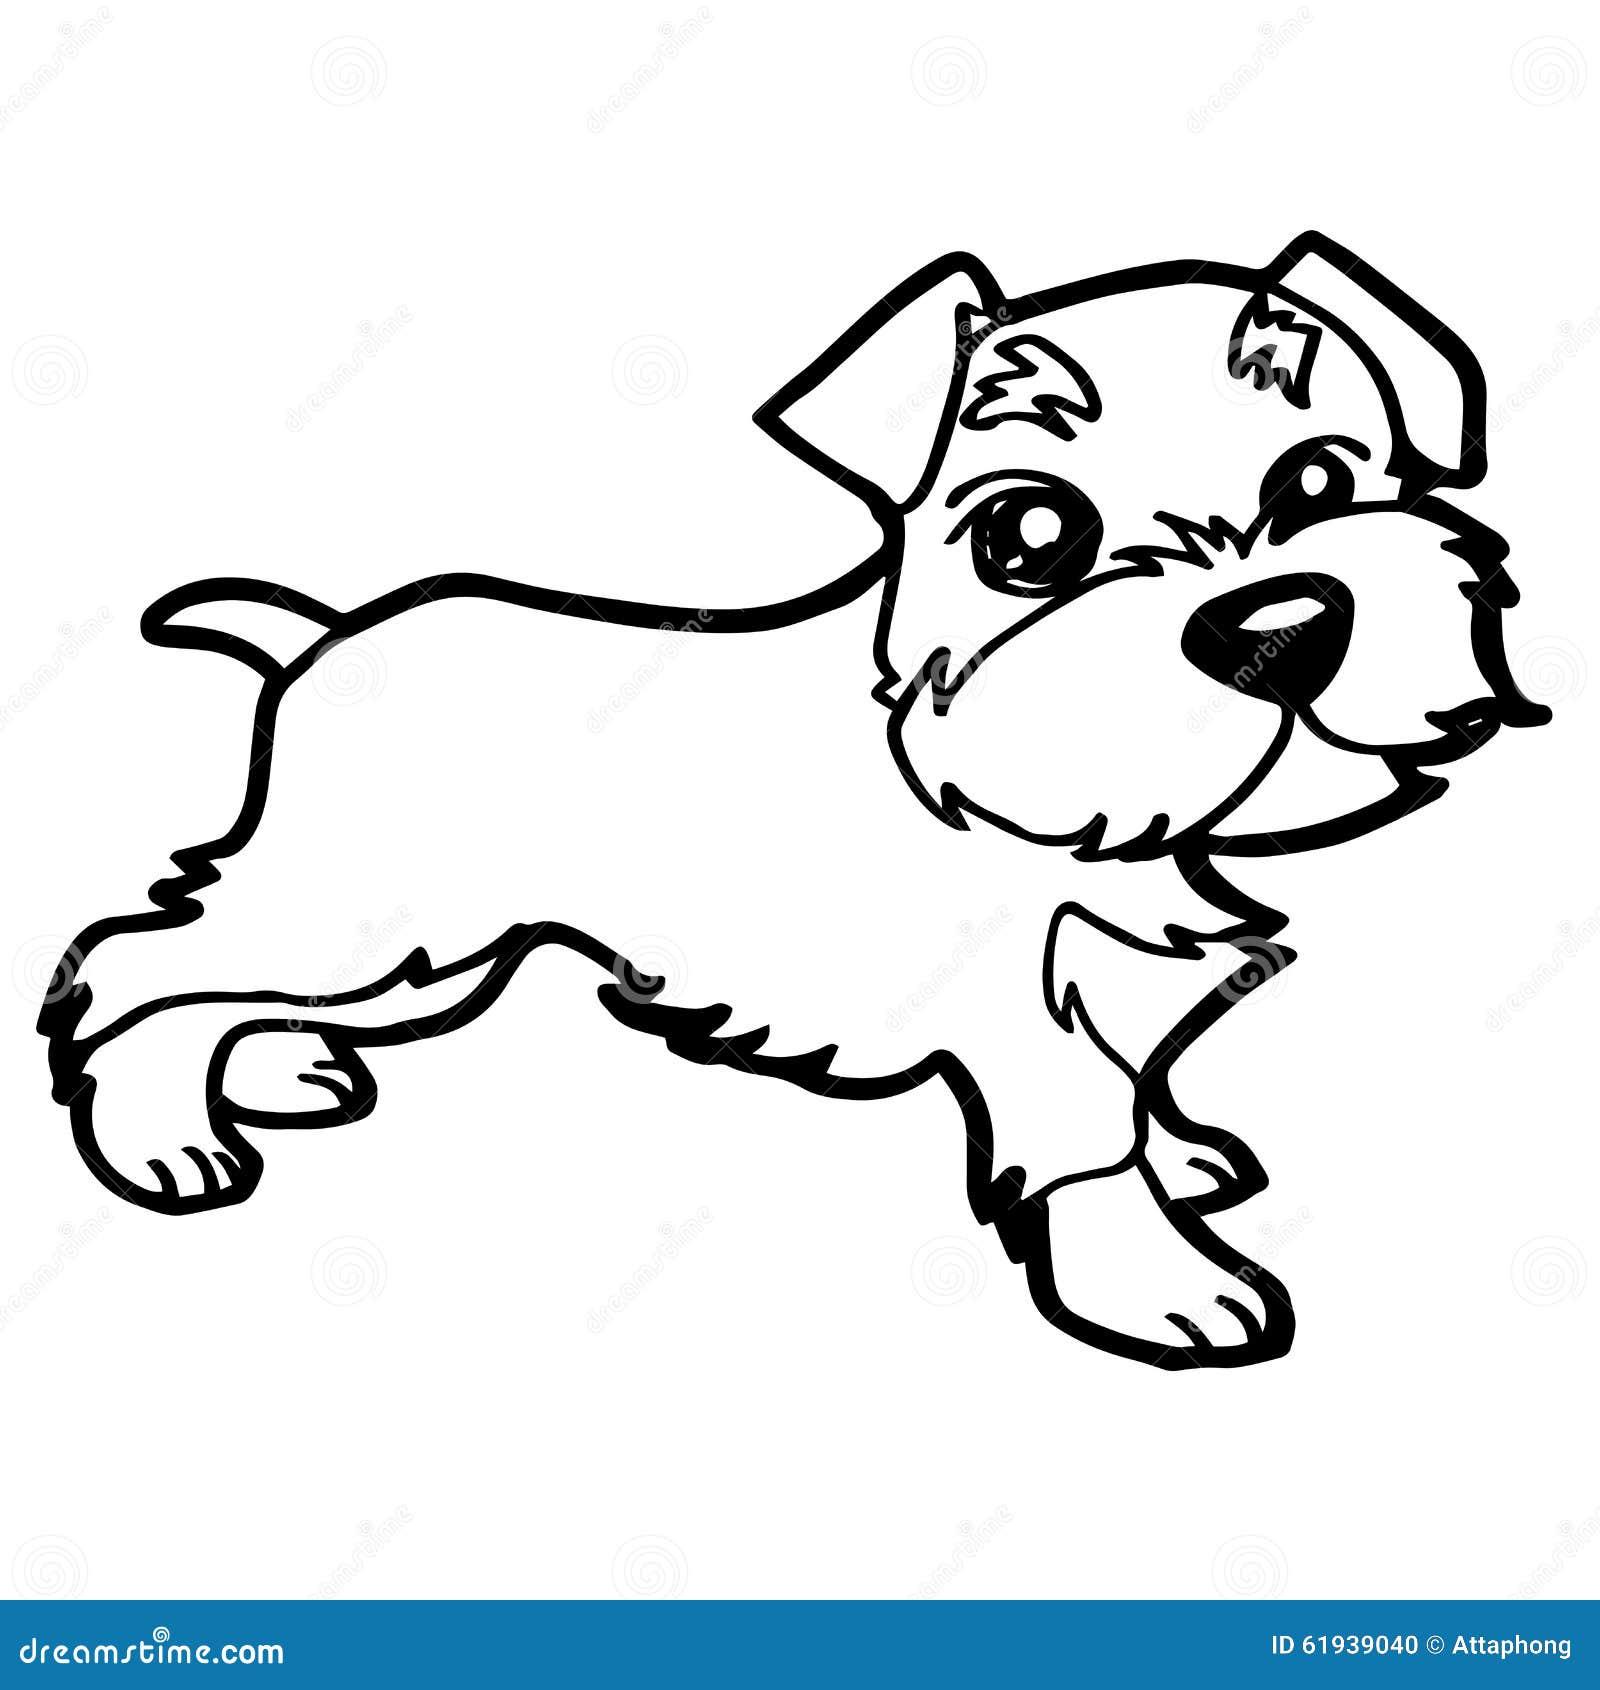 Cartoon Illustration Of Funny Dog